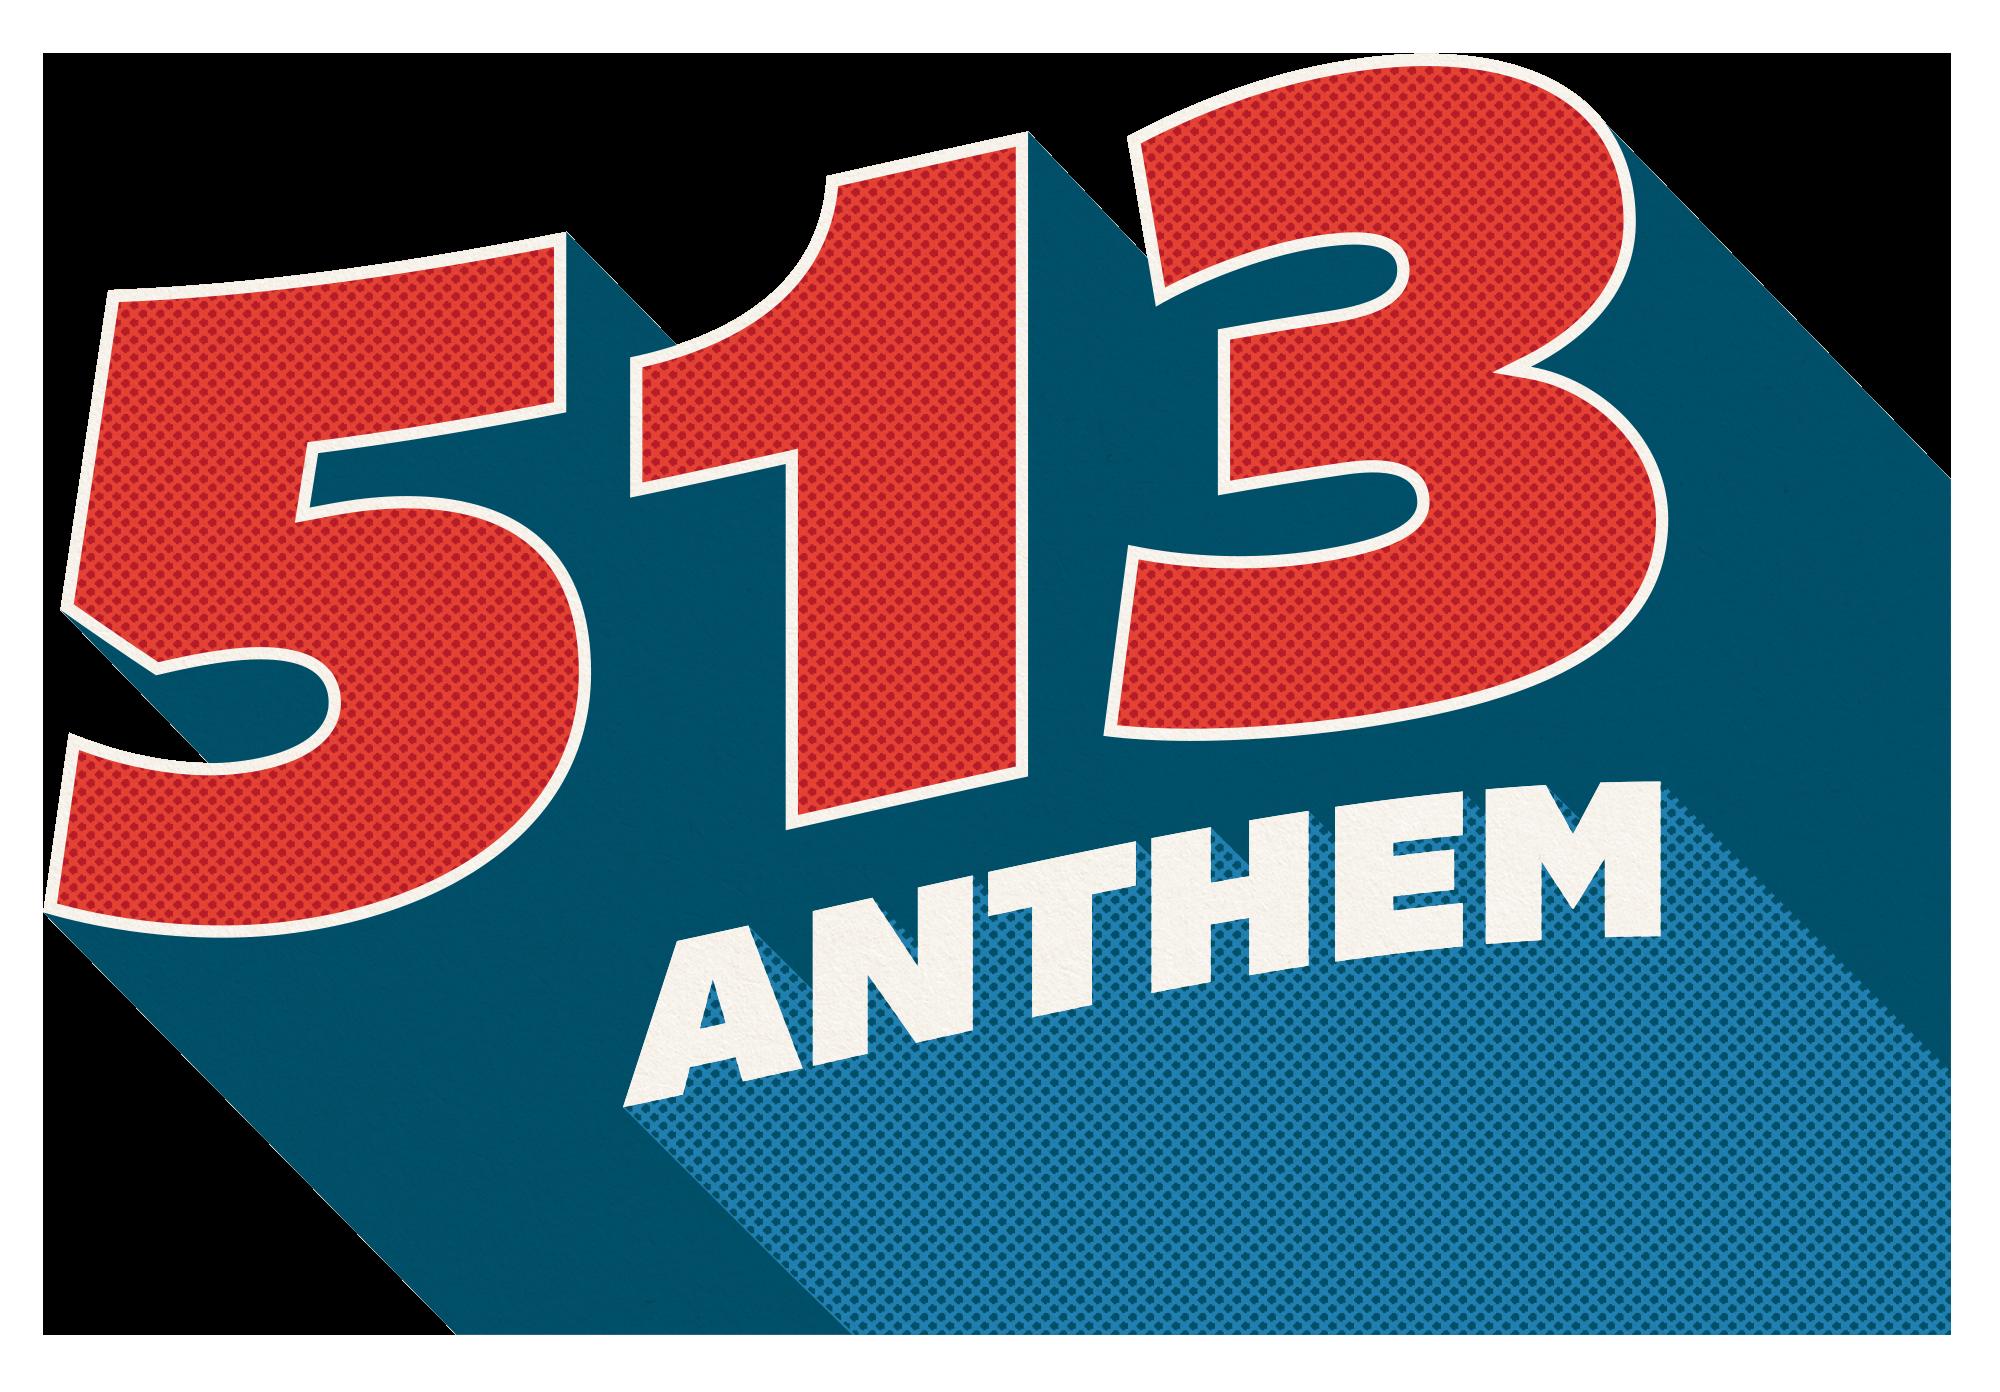 513 Anthem